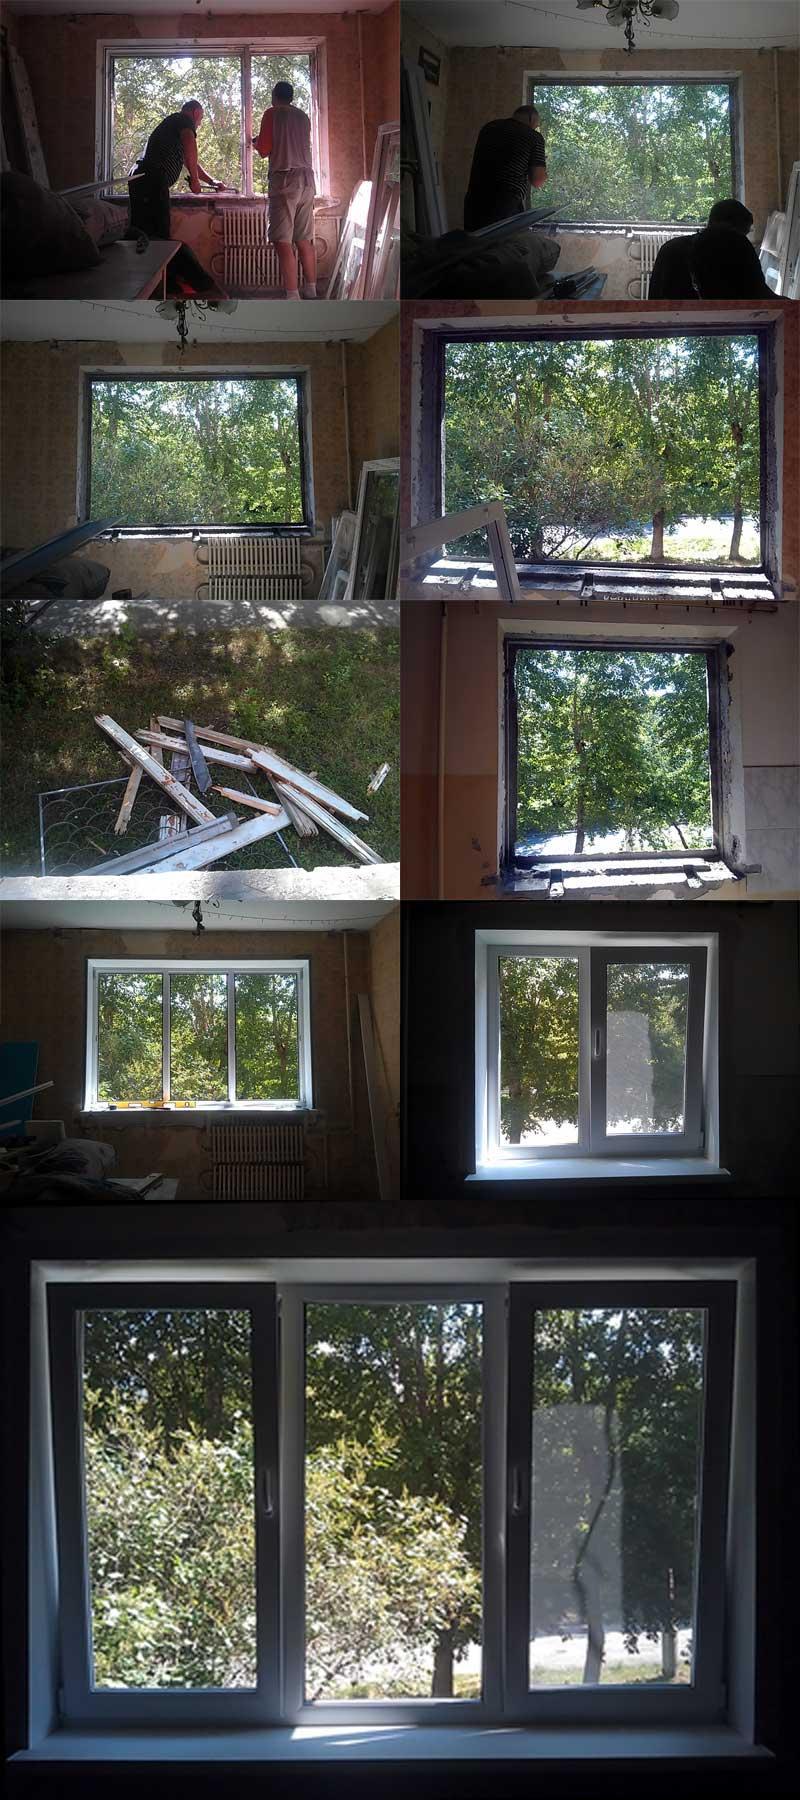 (22.07.2013 blogger) Поставили пластиковые окна - В комнате и на кухне